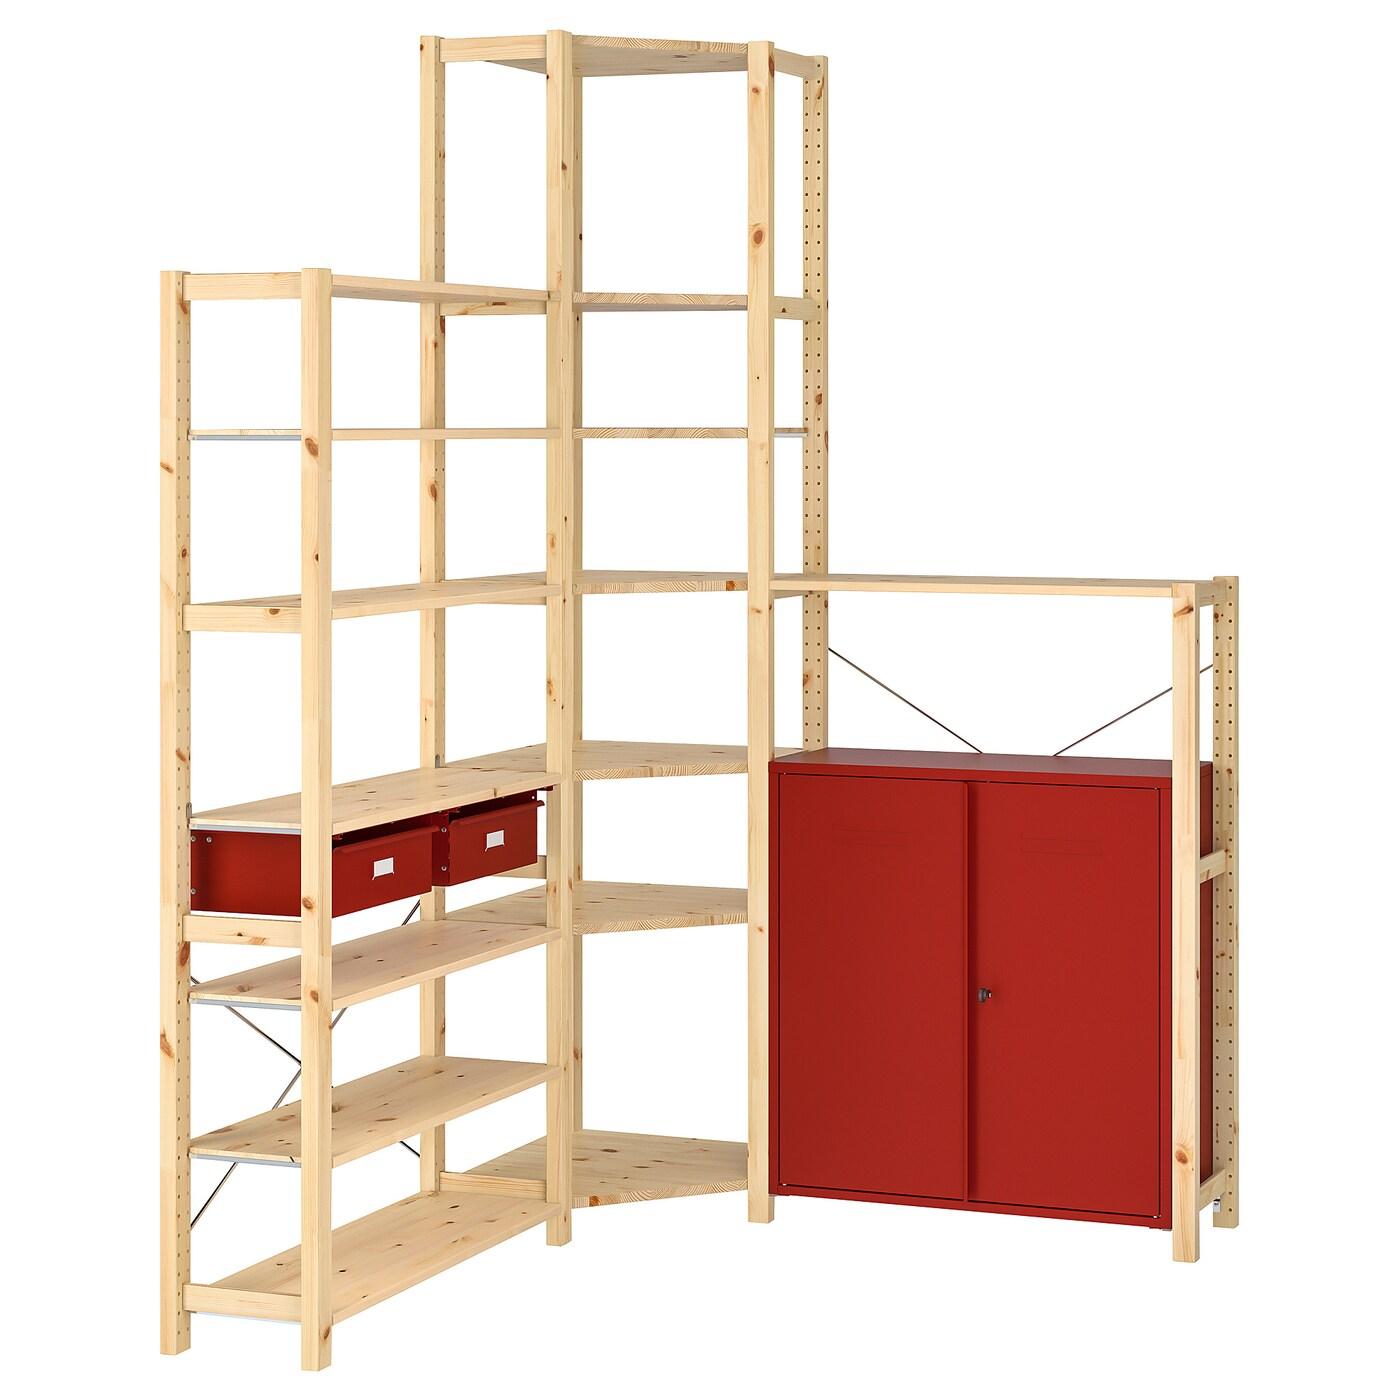 Ivar Corner Shelf Unit W Cabinet Drawers Pine Red 57 1 8 57 1 8x11 3 4x89 Ikea,Reflections Bedroom Set